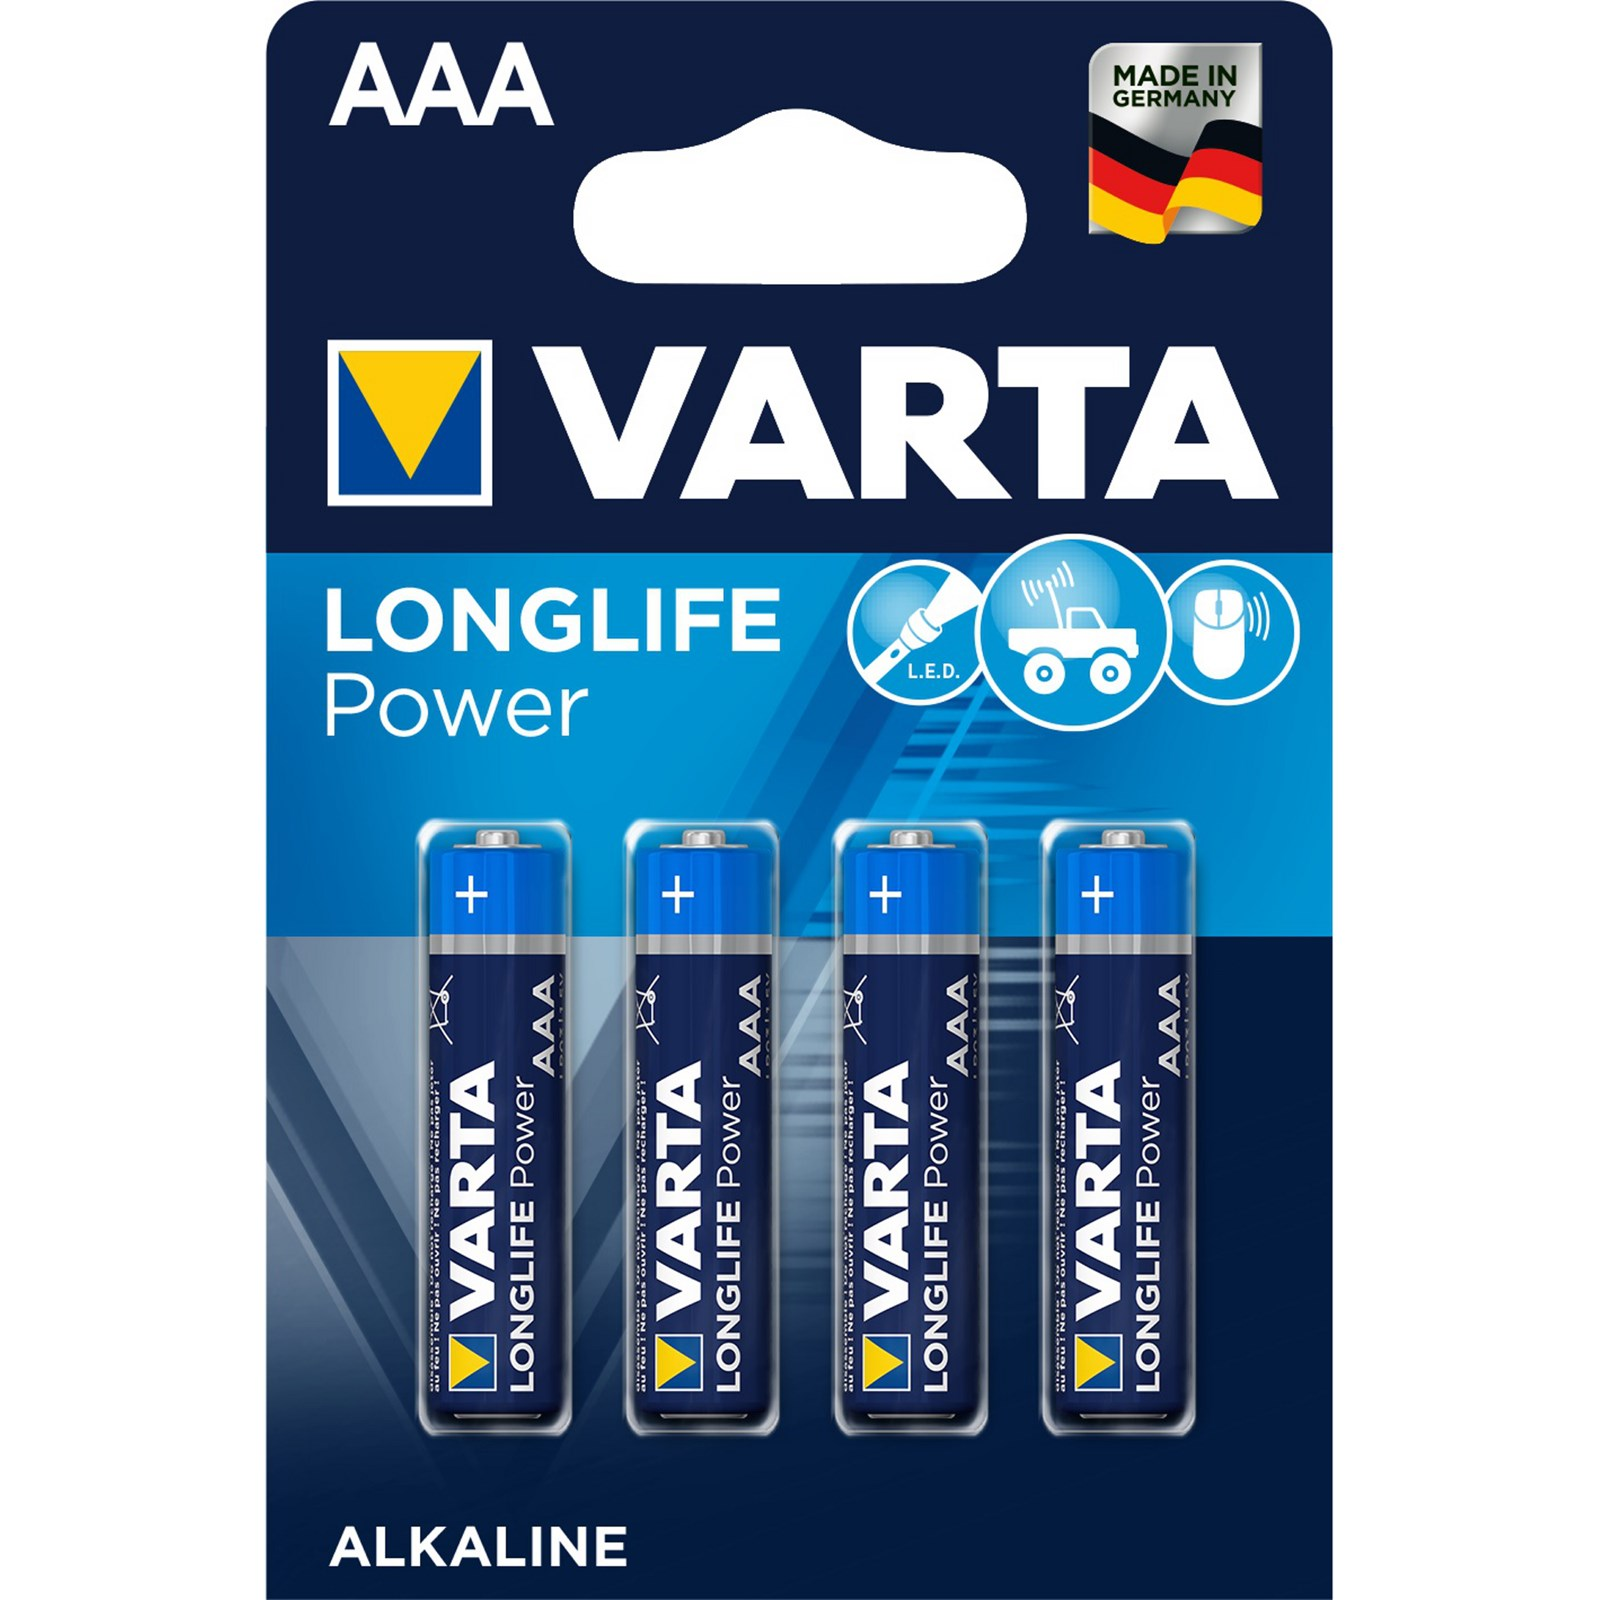 Battery Alkaline Manganese Size Aaa